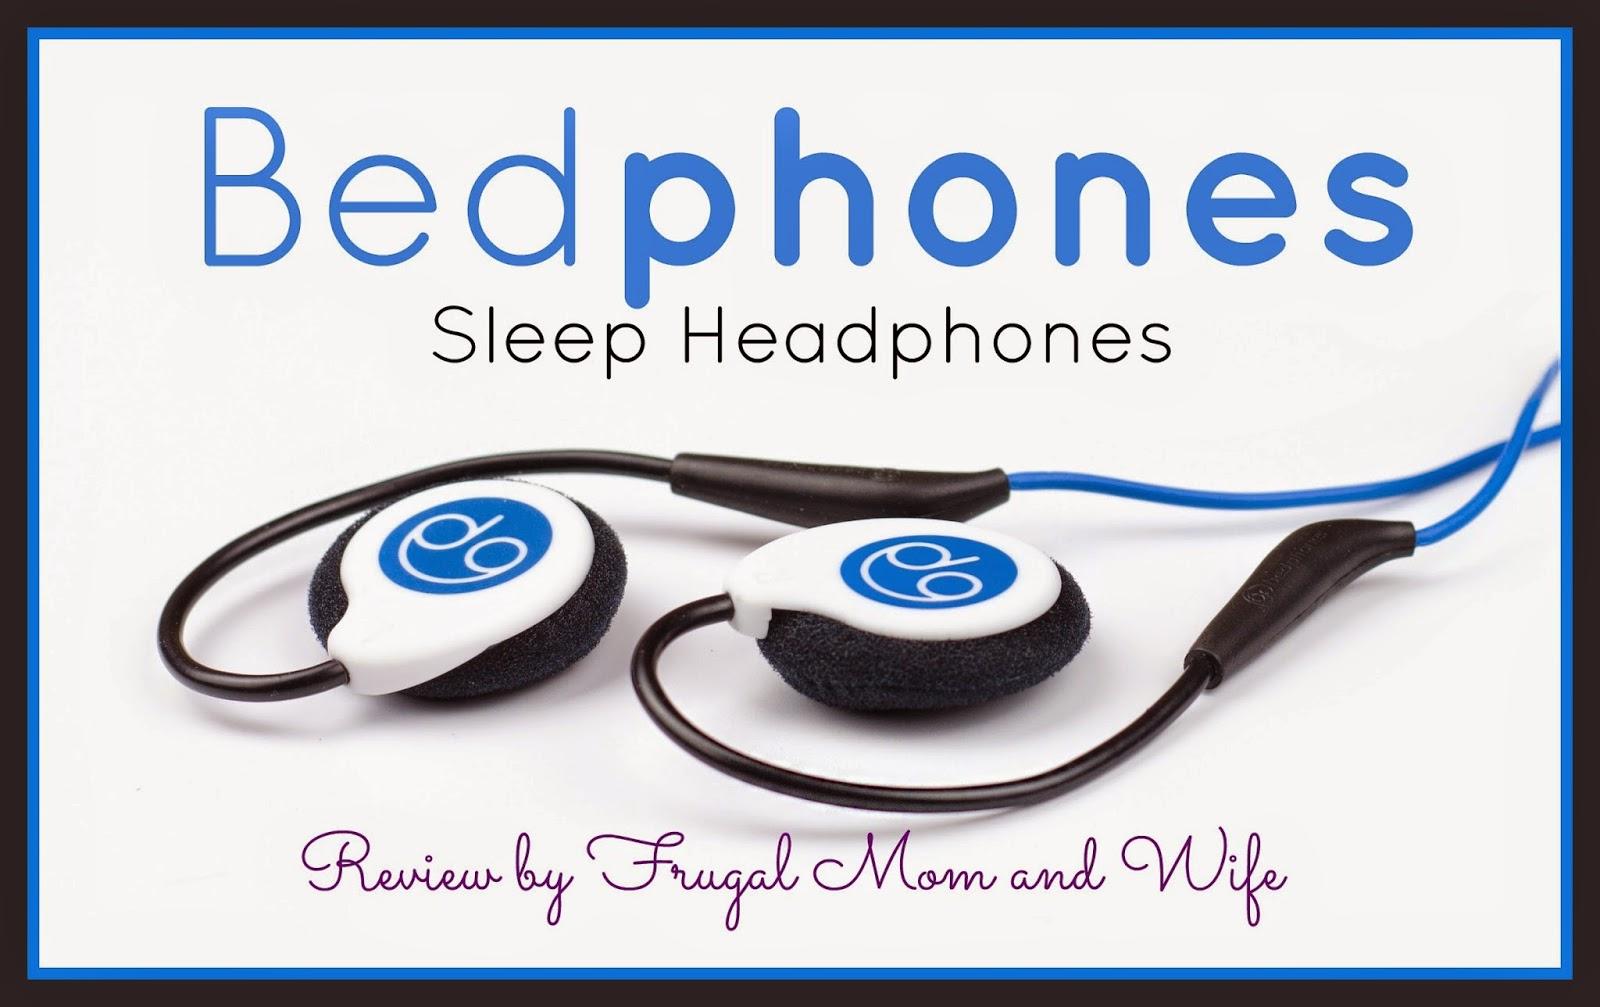 Frugal Mom And Wife Bedphones Sleep Headphones Review